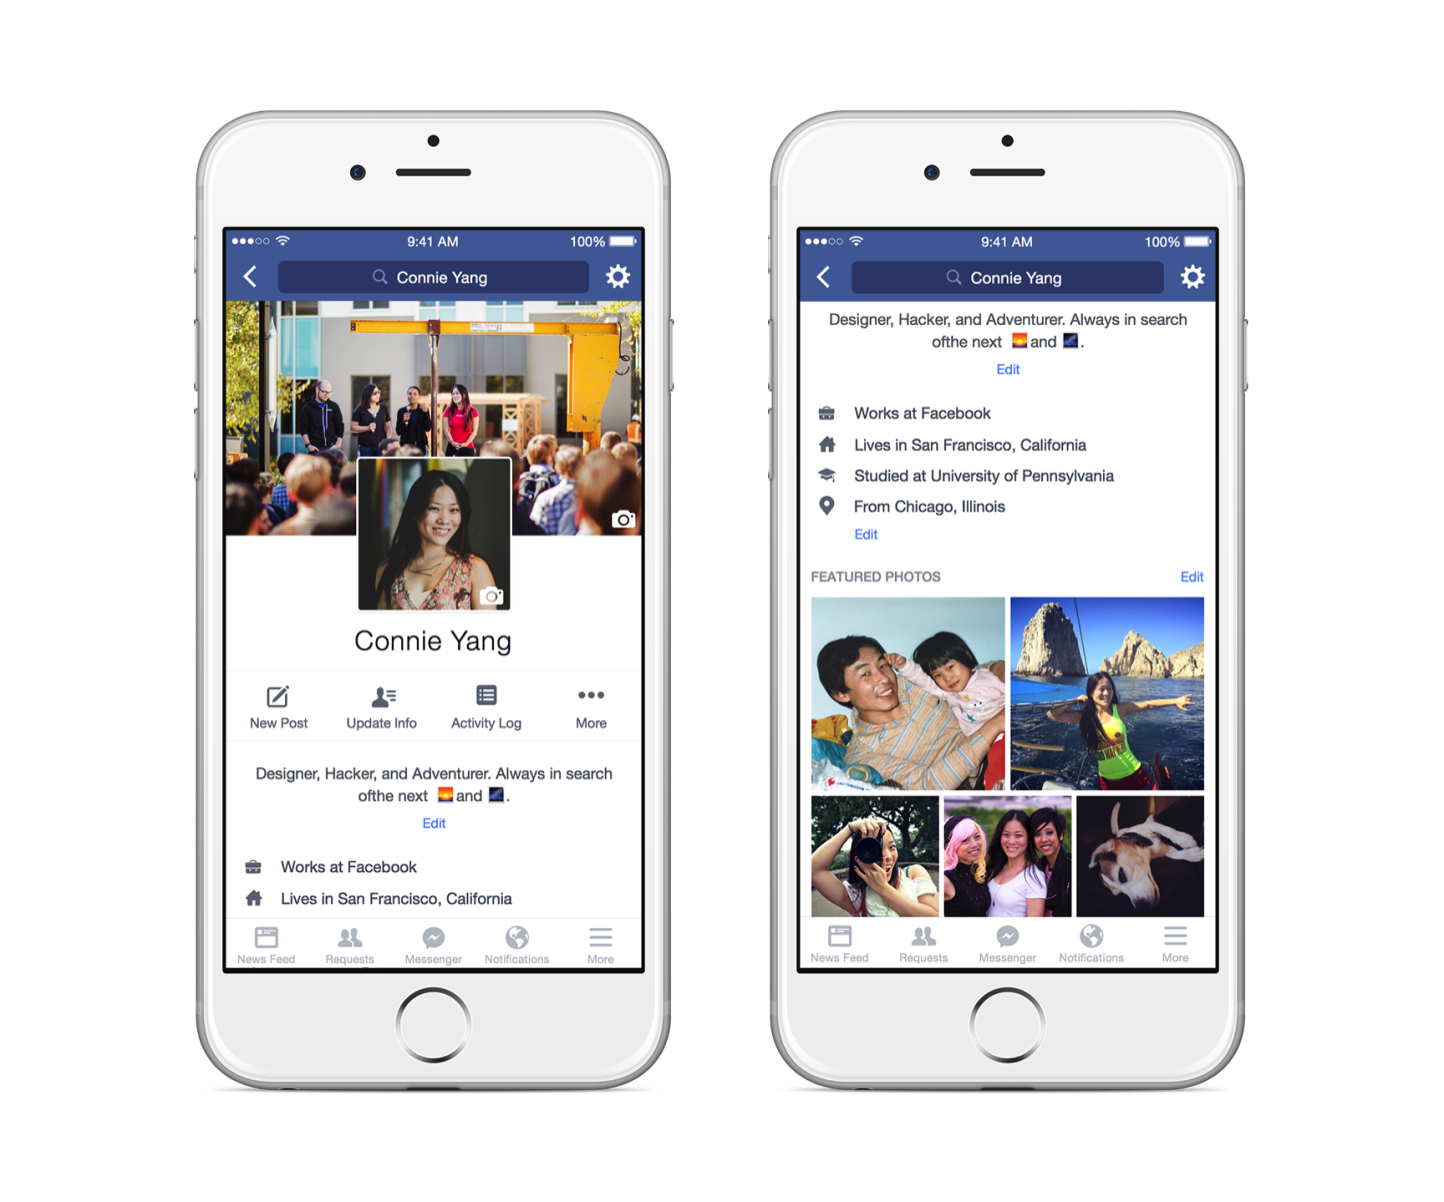 Facebookの新しいプロフィールページ